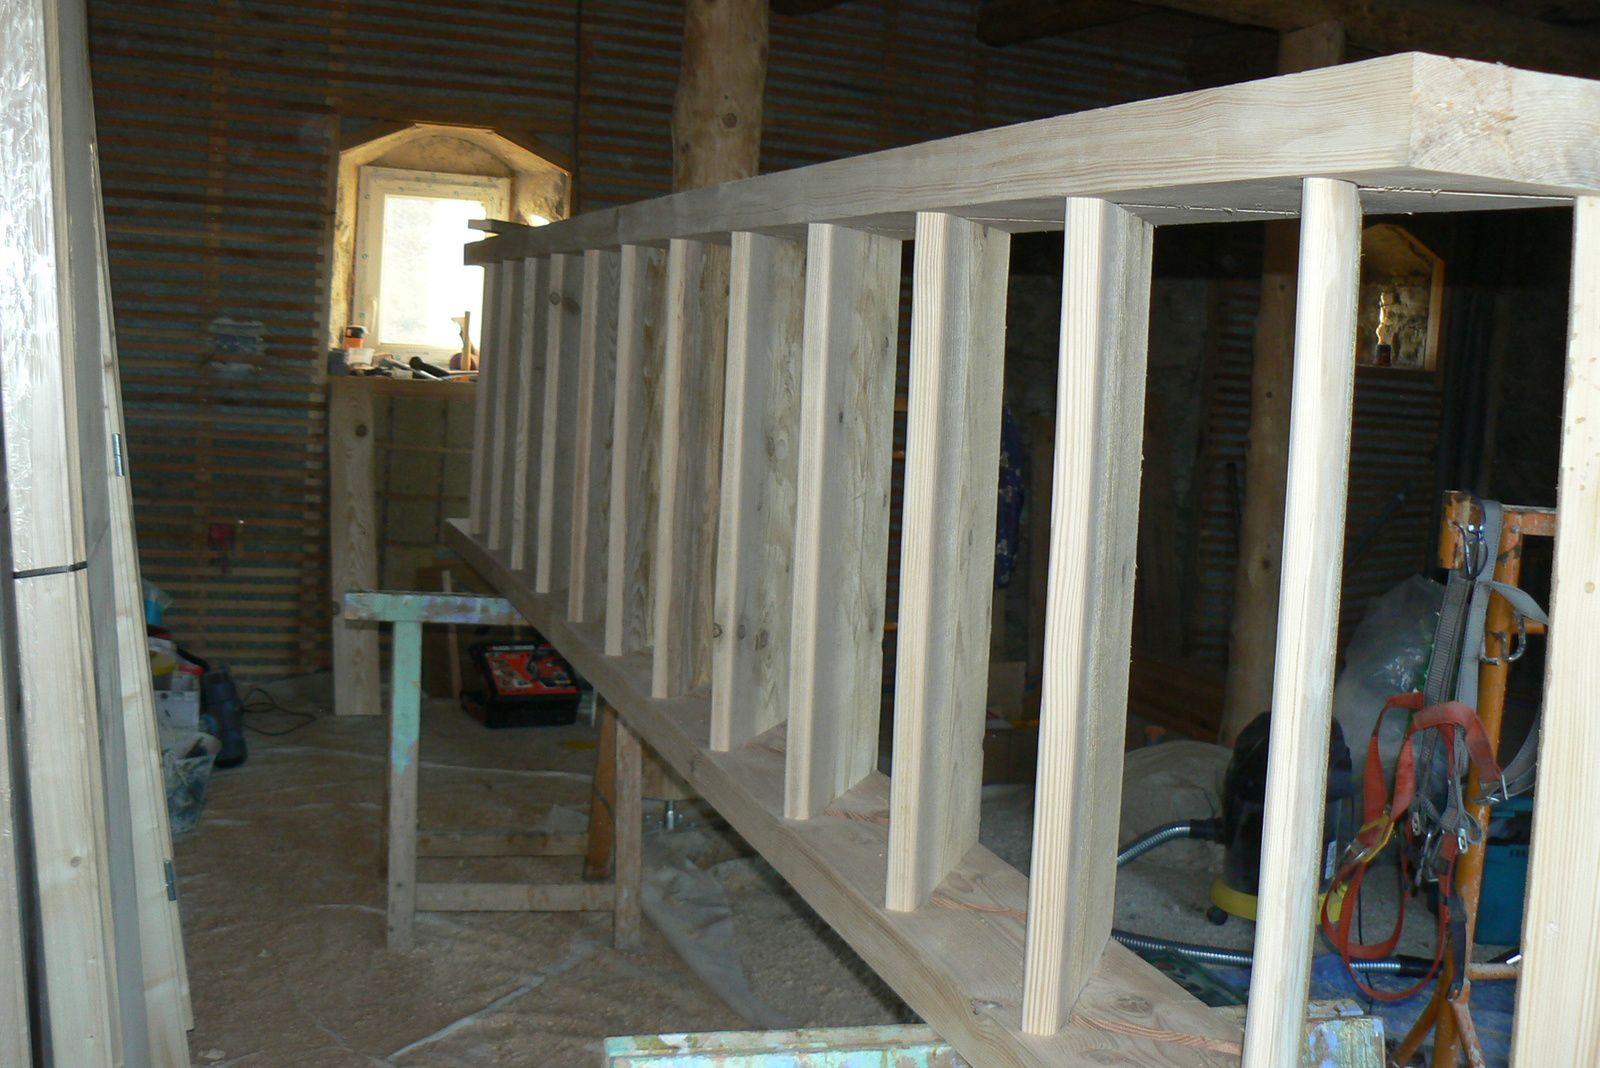 Escalier en bois, mode d'emploi